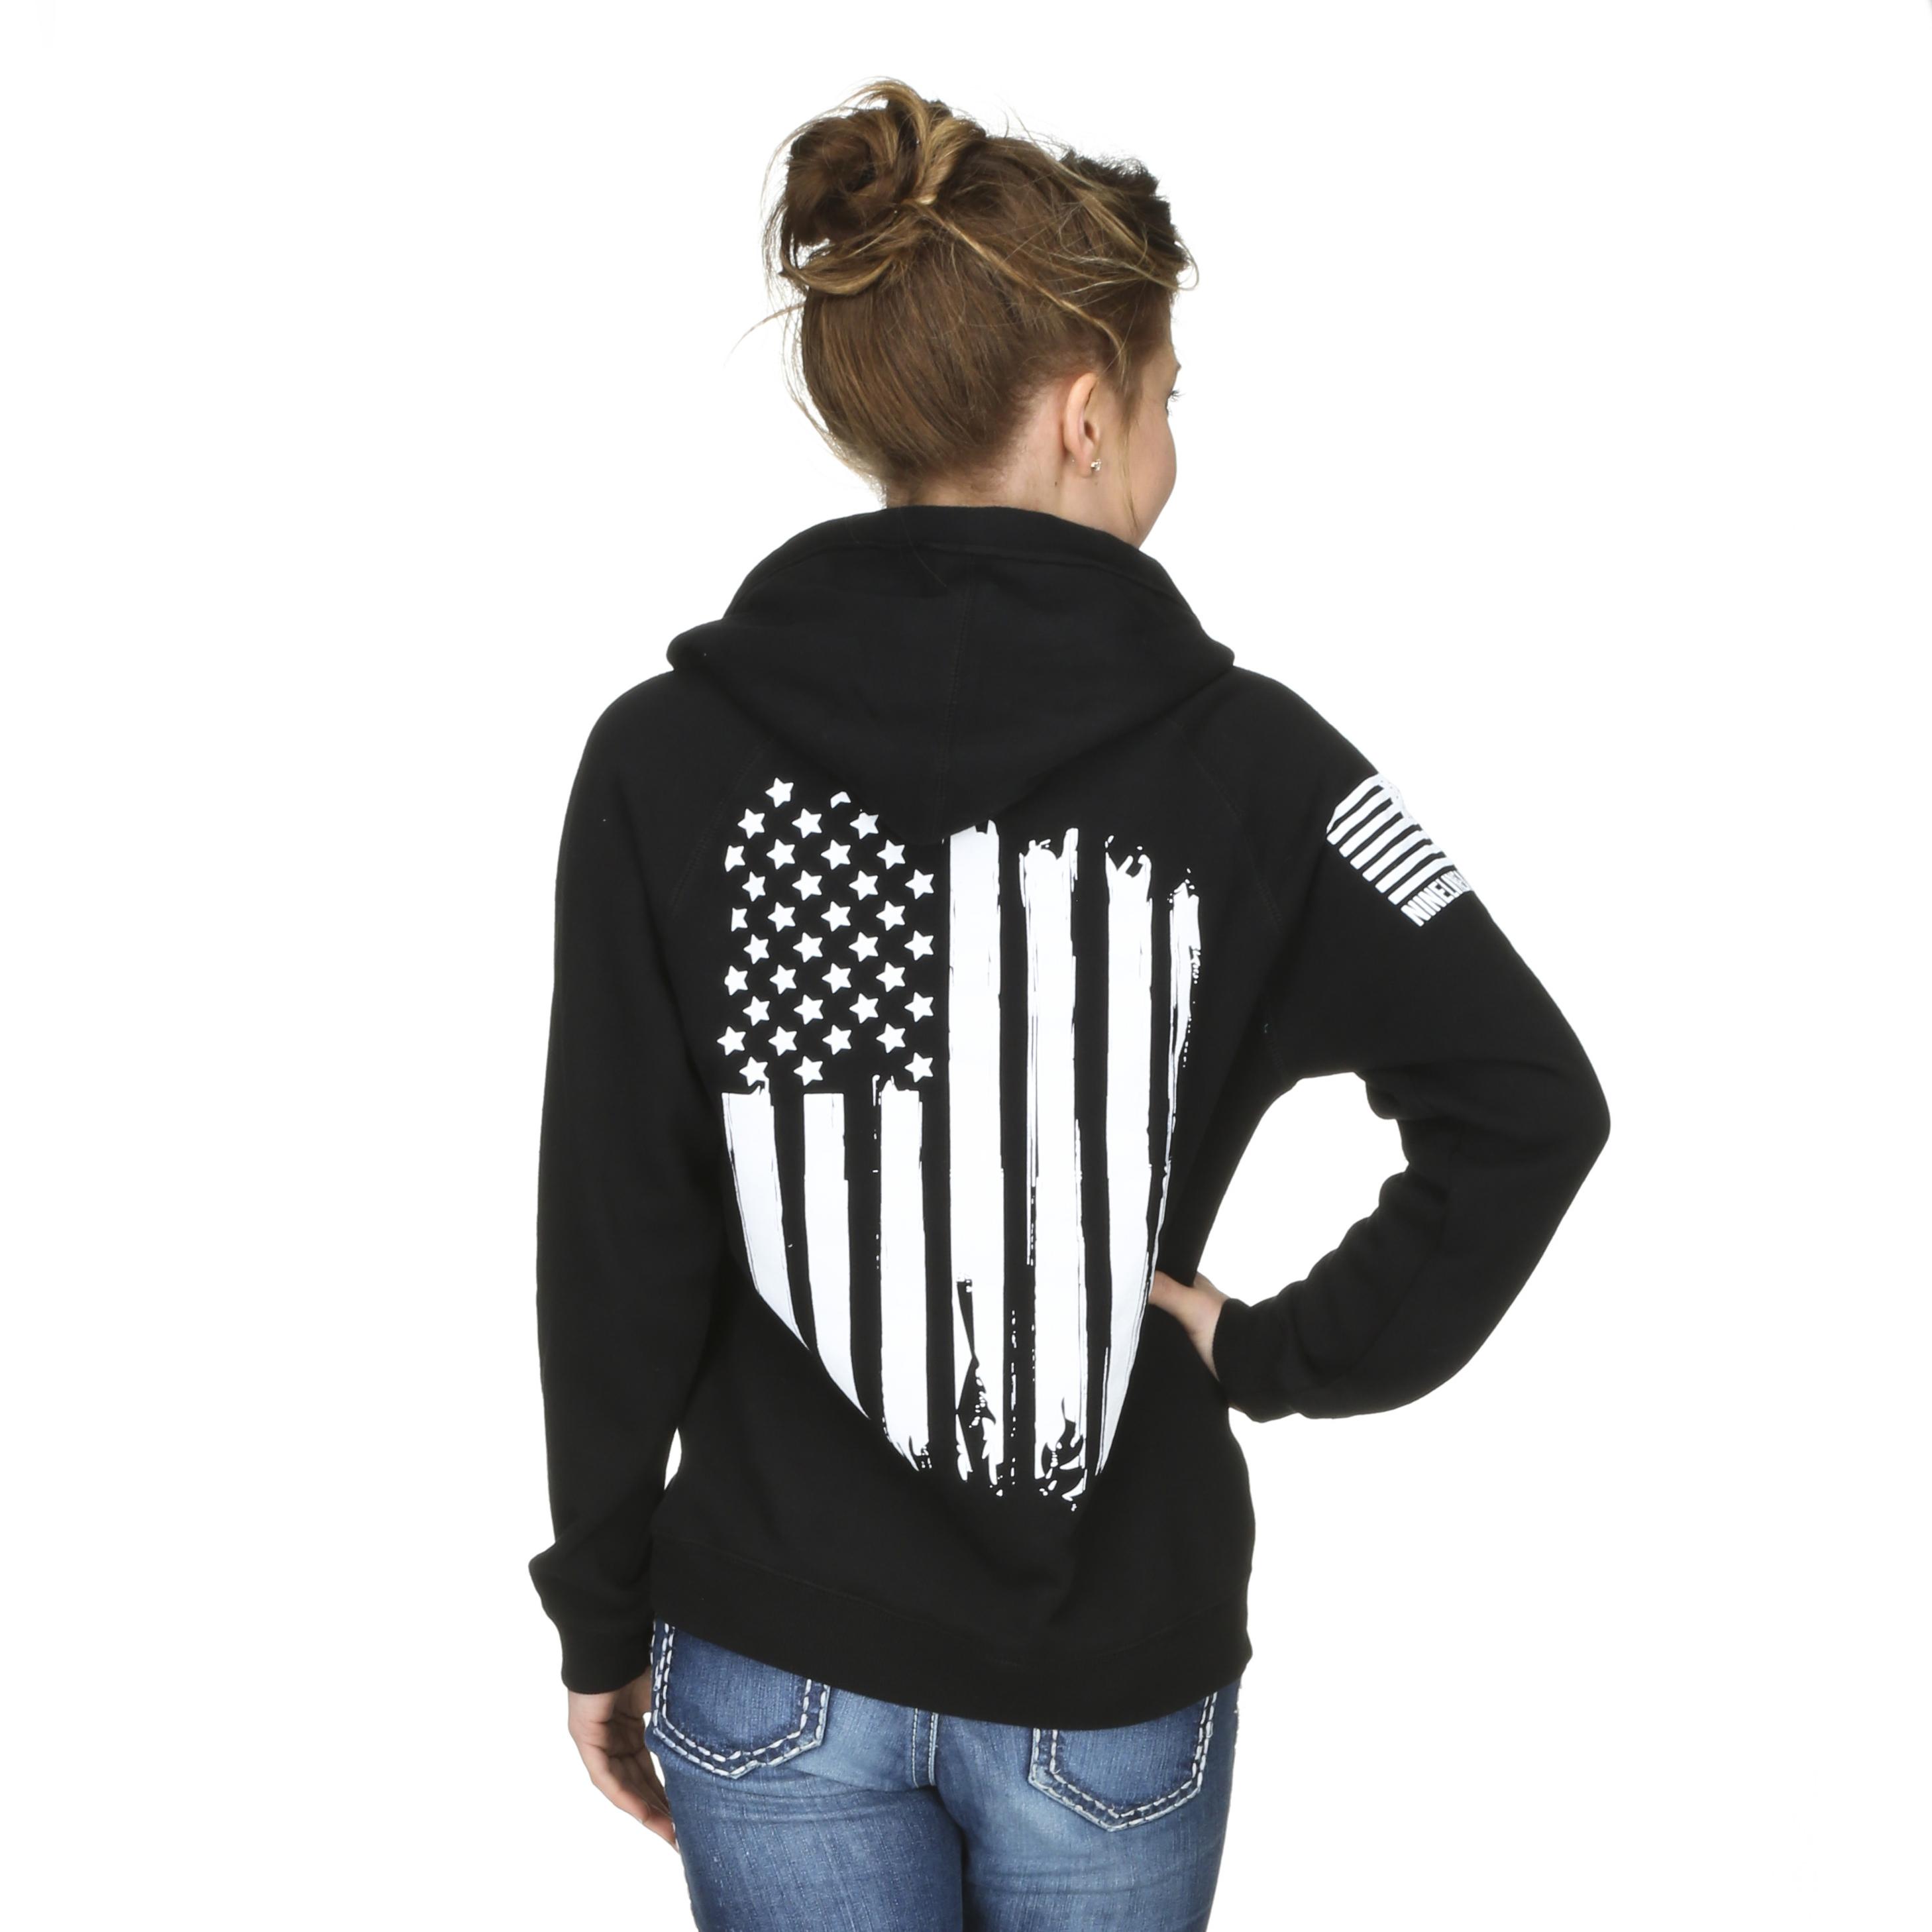 Nine Line Apparel - Women's American Flag V-Neck     - Murdoch's